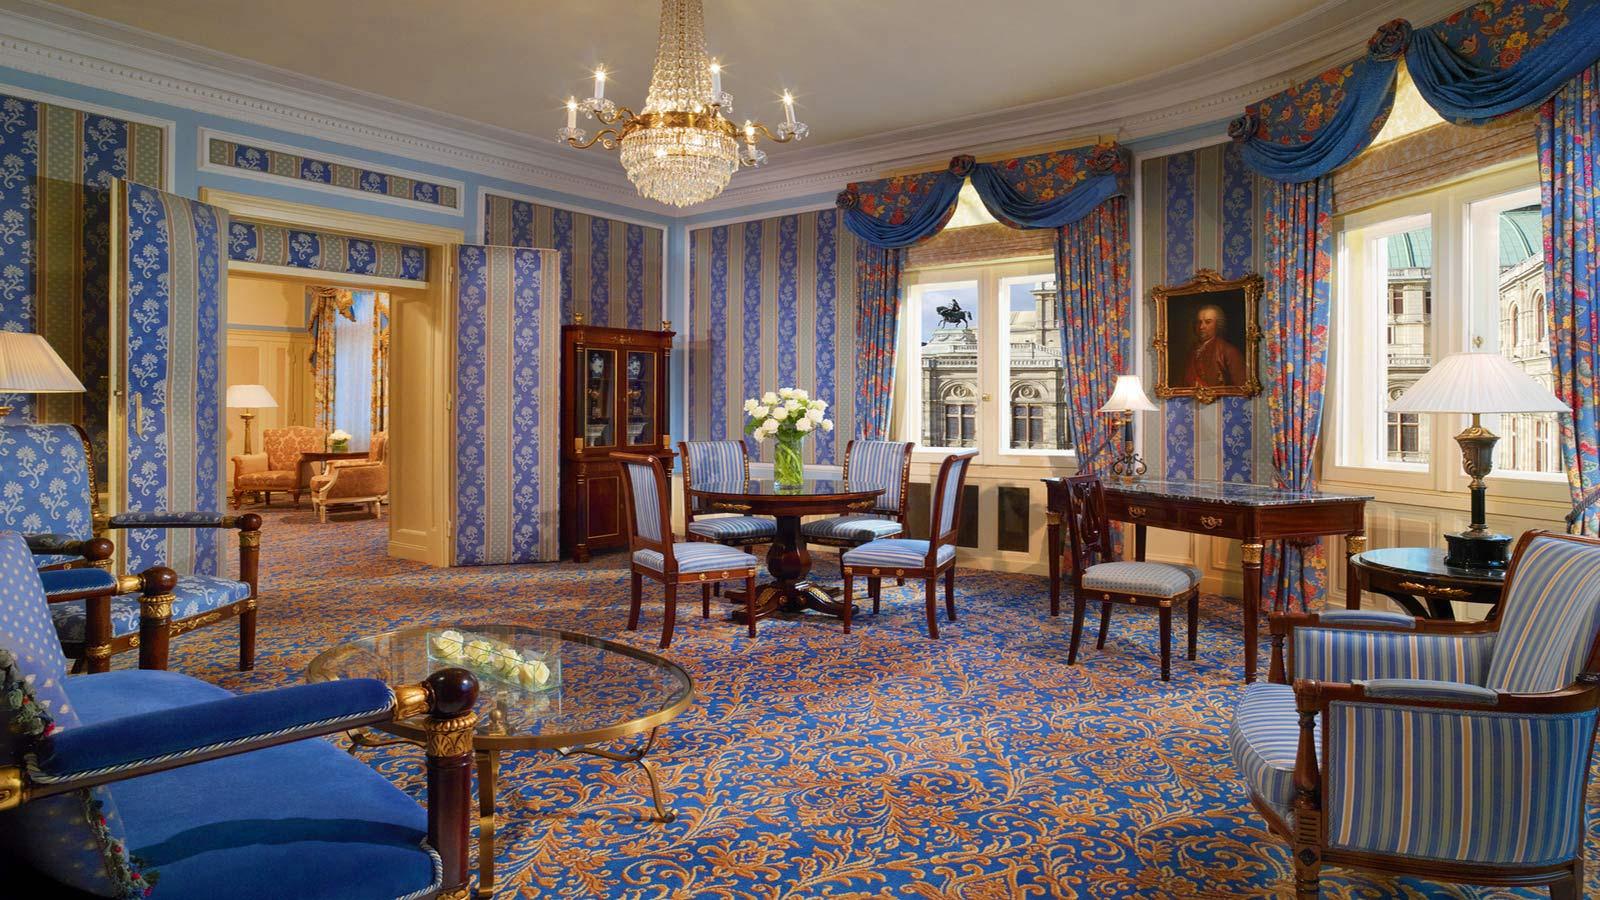 Hotel Bristol, Vienna - AspirnatSG